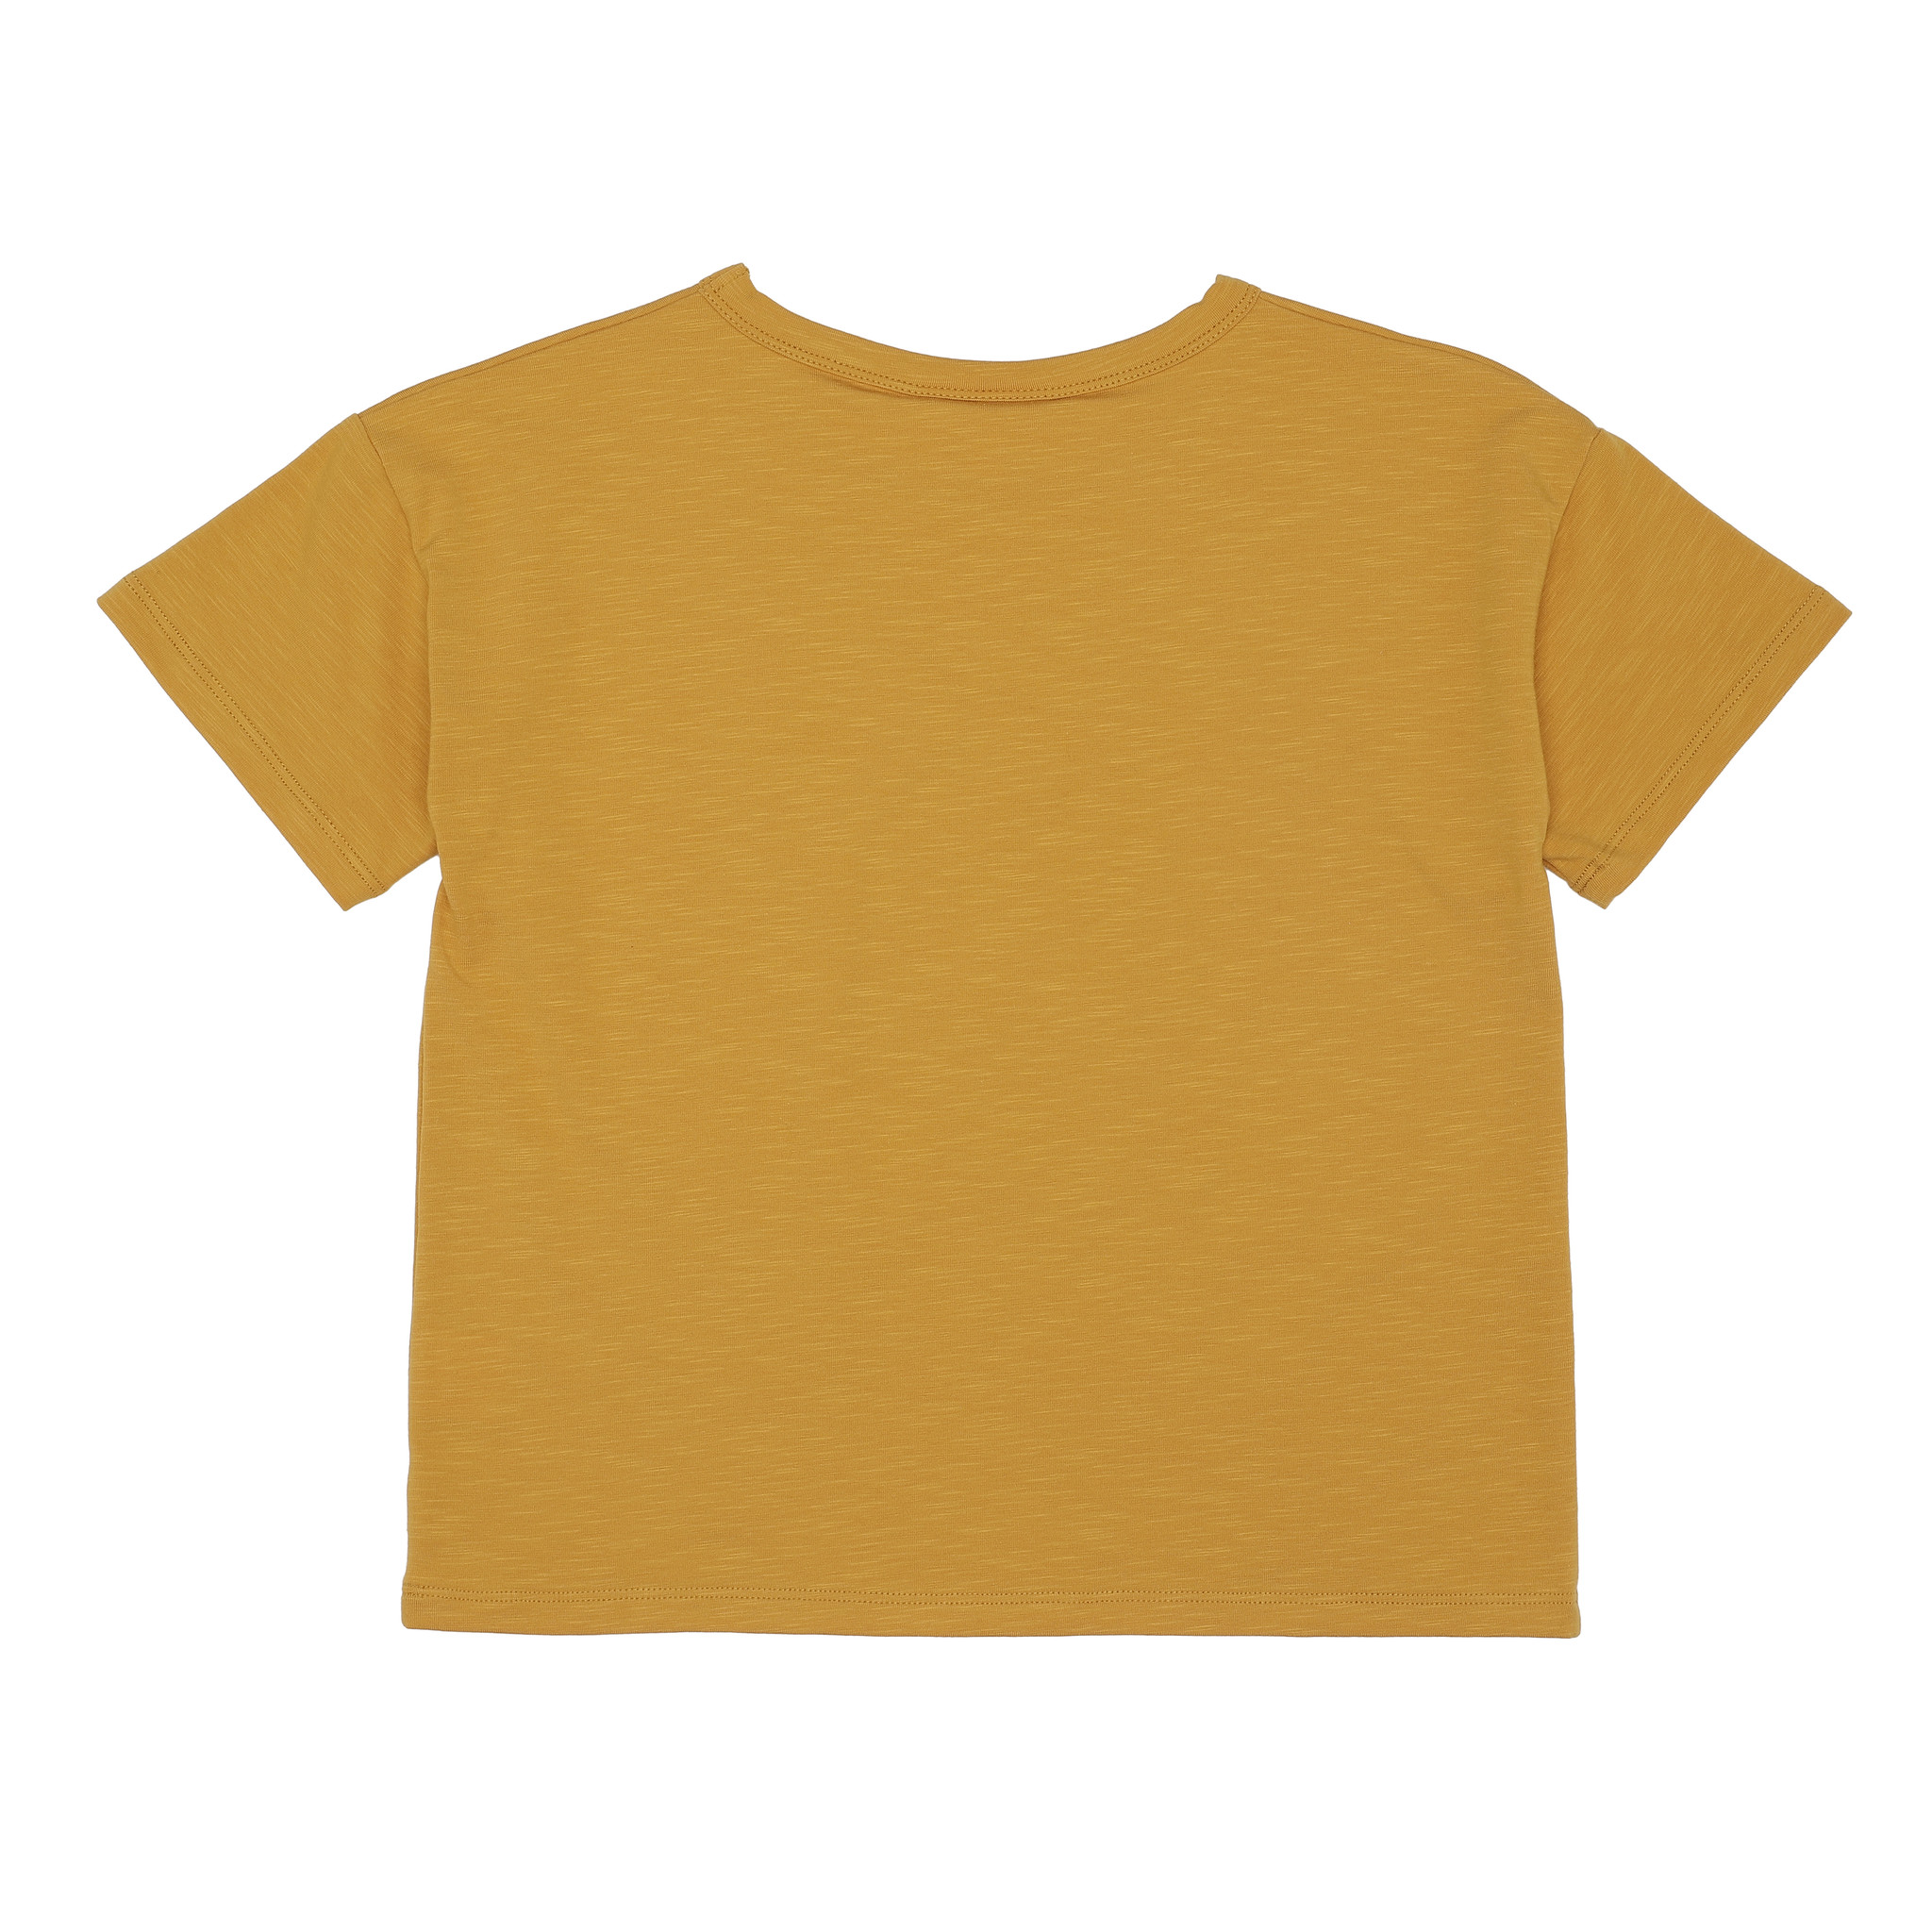 Dharma T-shirt - Sunflower / Plum-3